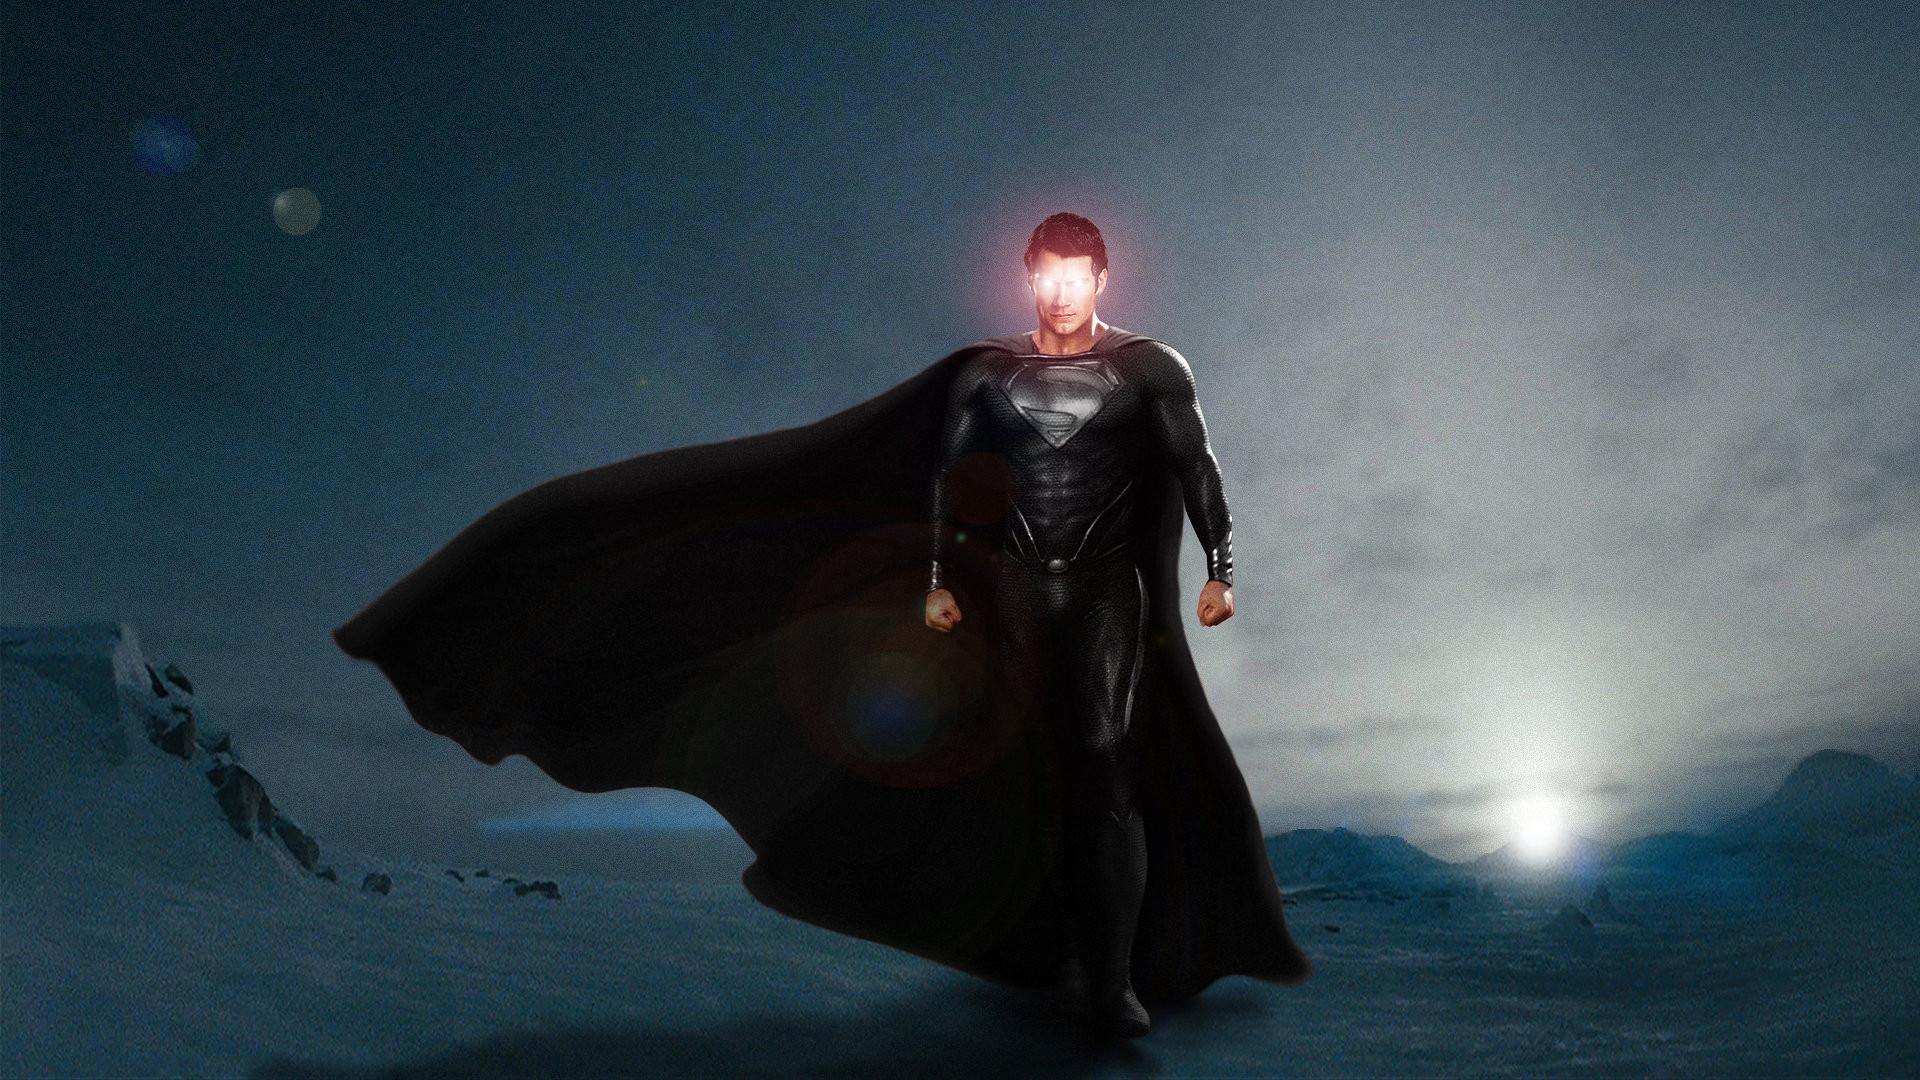 The Man of Black Steel by ProfessorAdagio